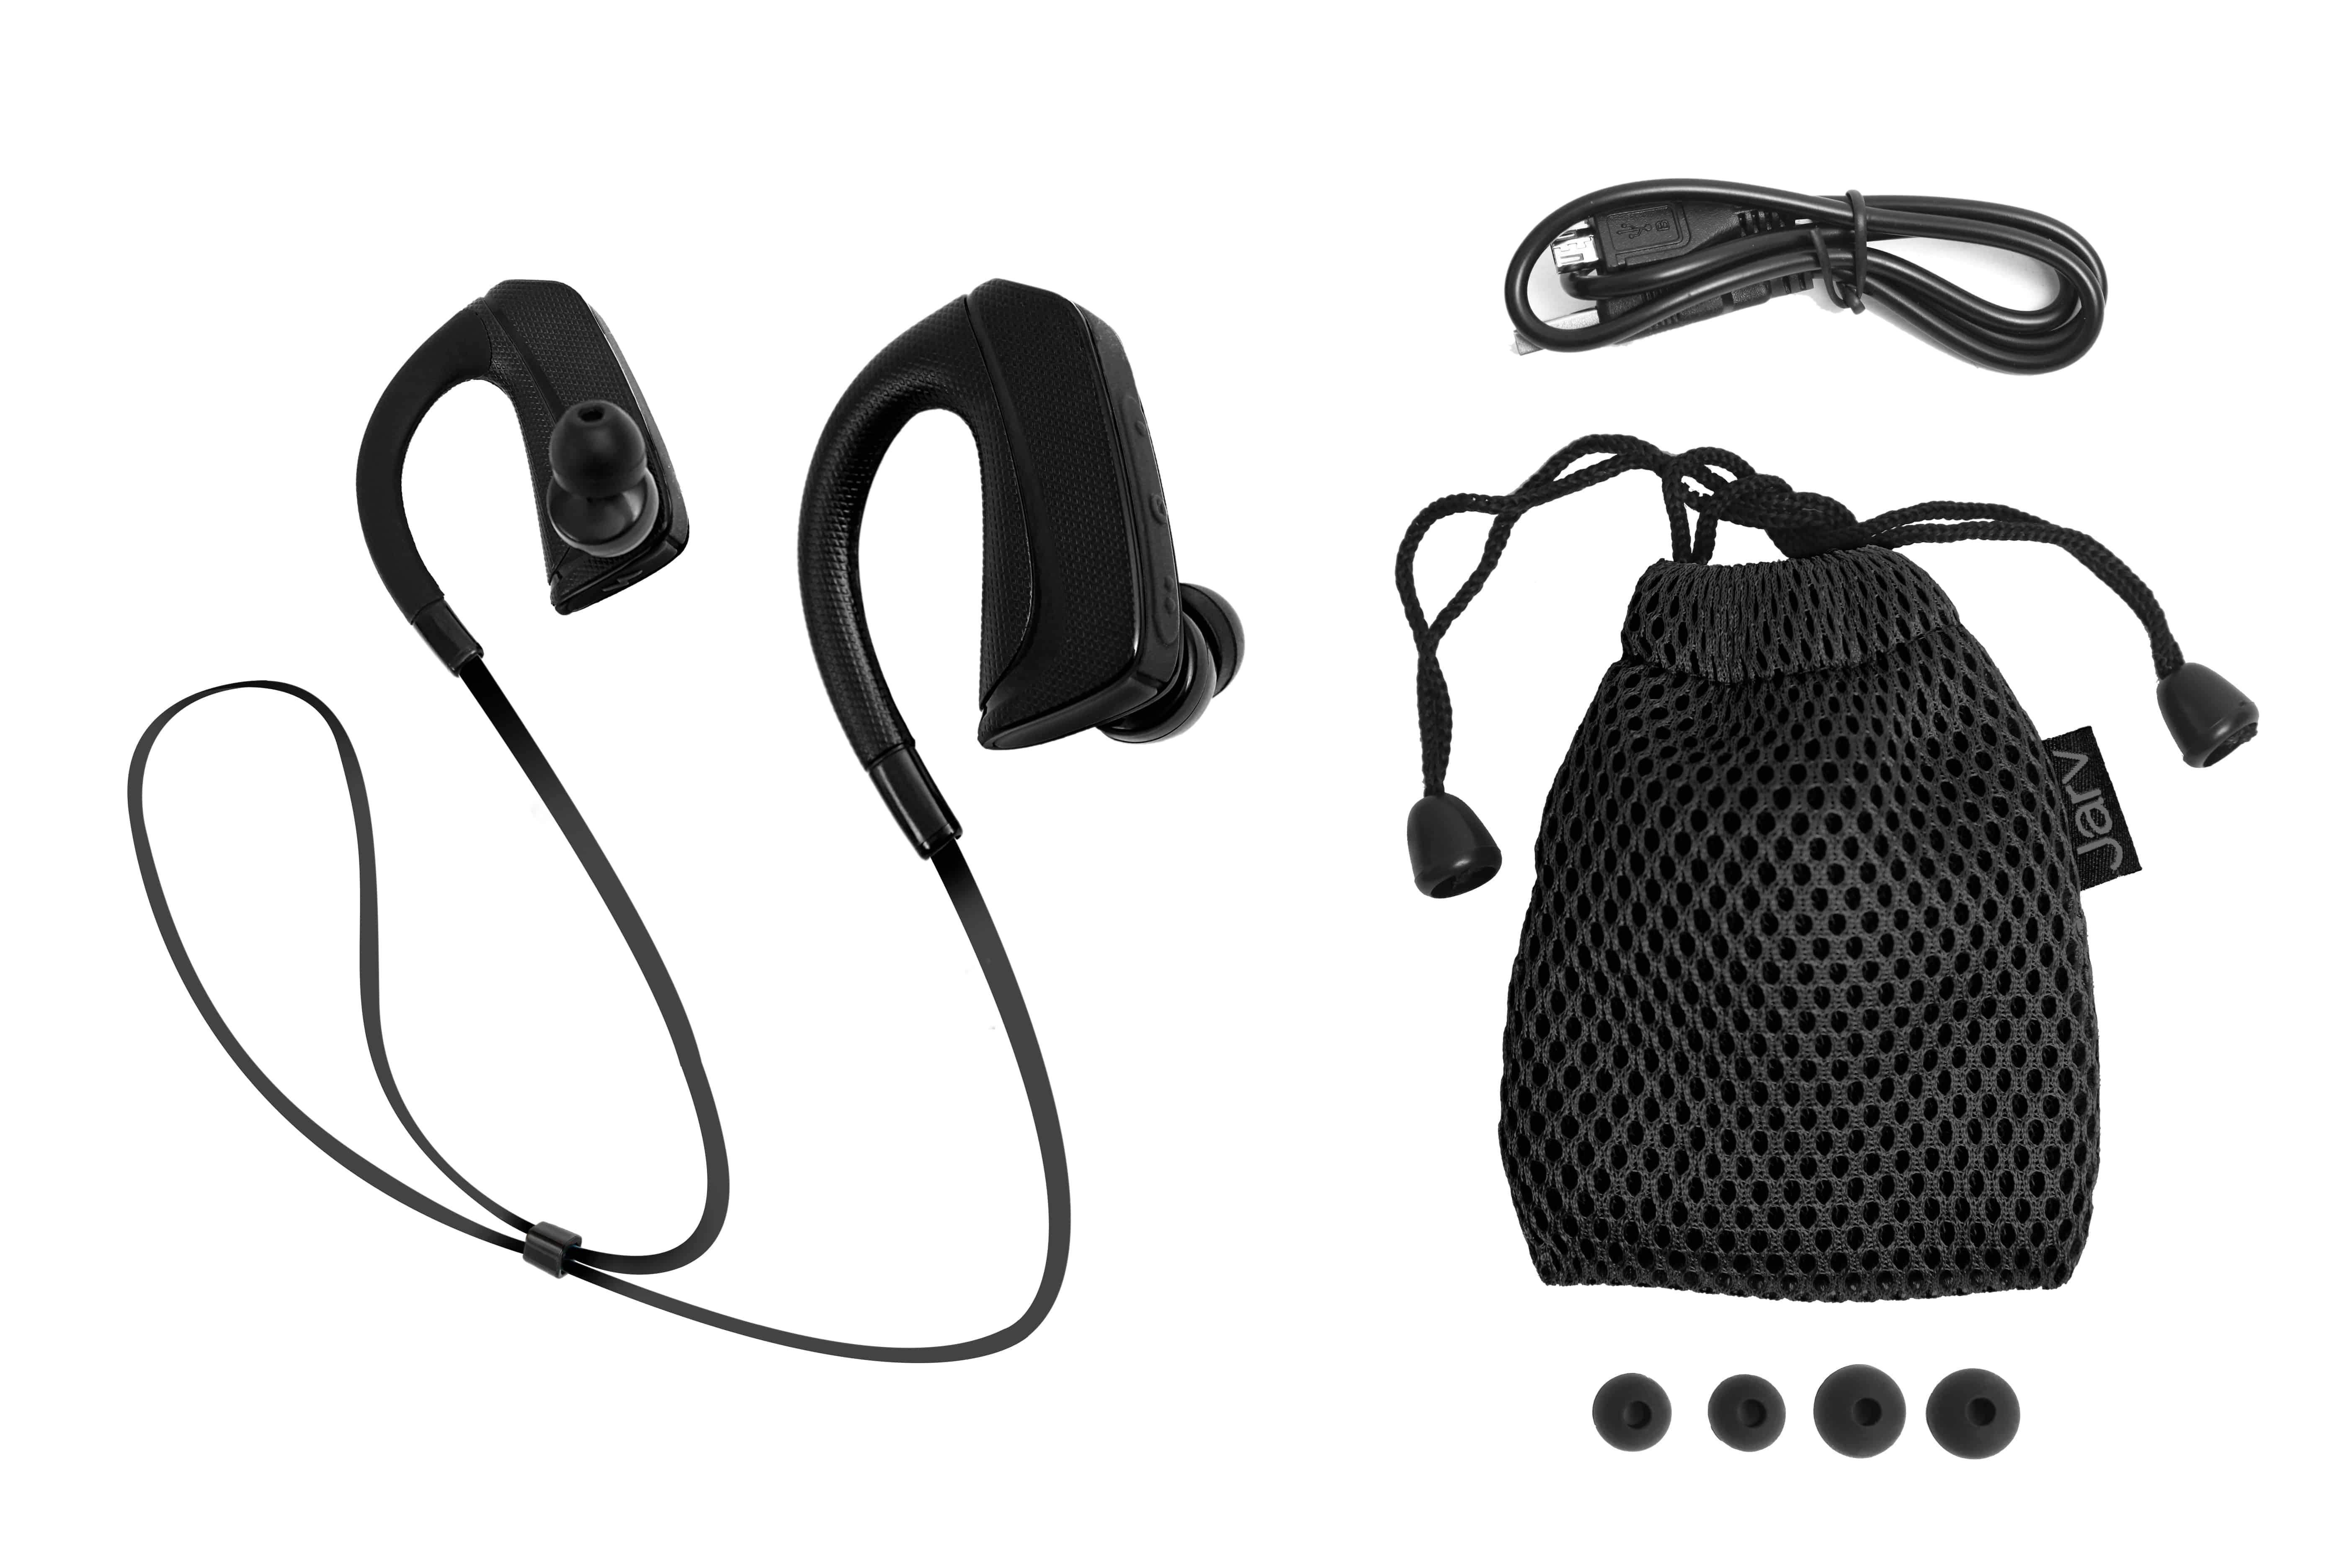 Jarv Pure Fit Sport Wireless Bluetooth Earbuds 03